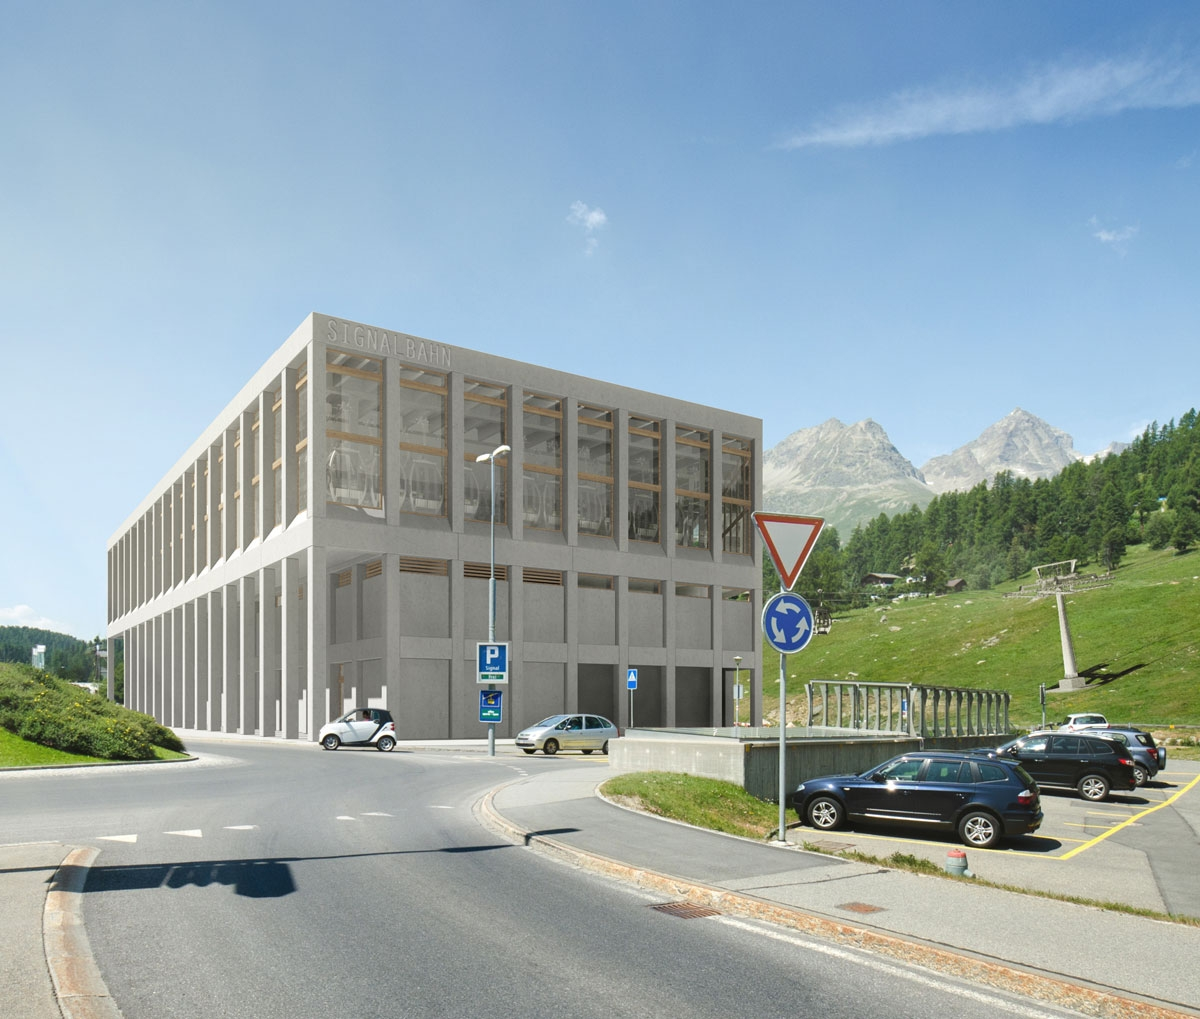 Dalstation Signalbahn - Engadin Sankt Moritz